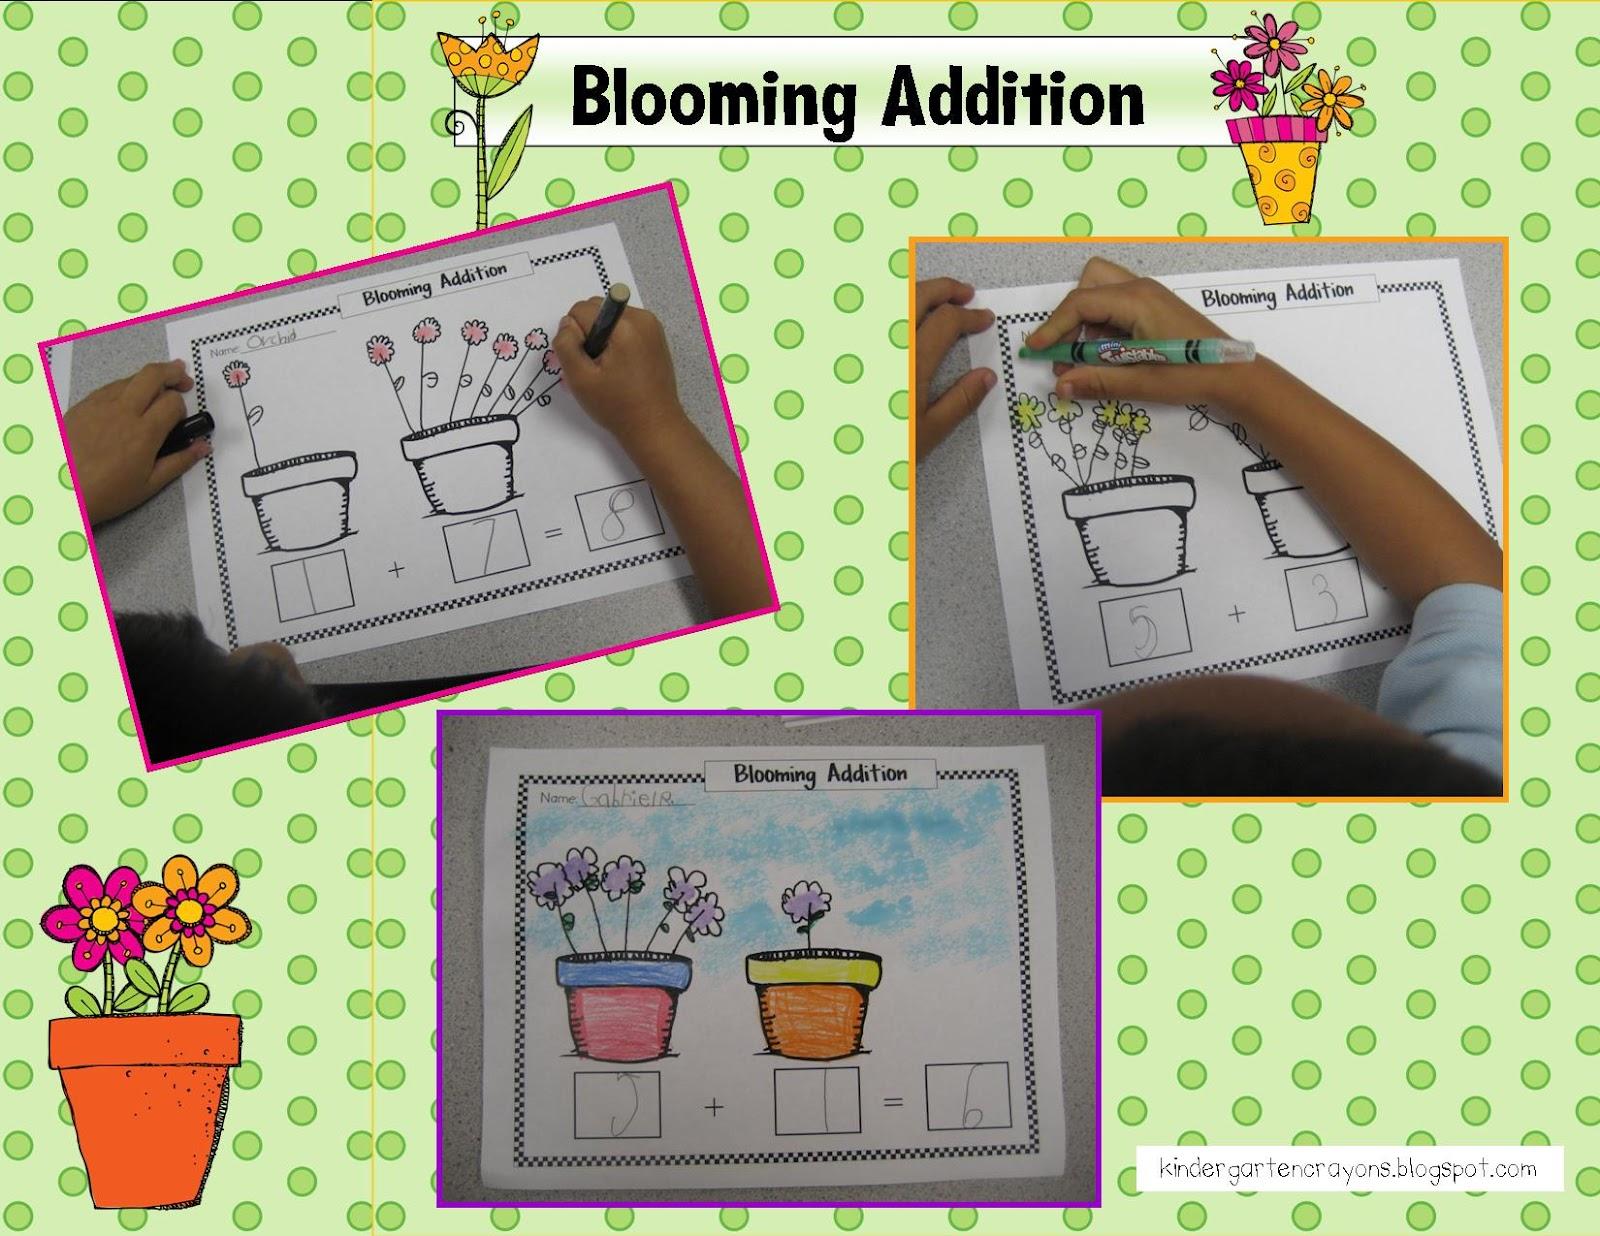 Kindergarten Crayons Blooming Addition